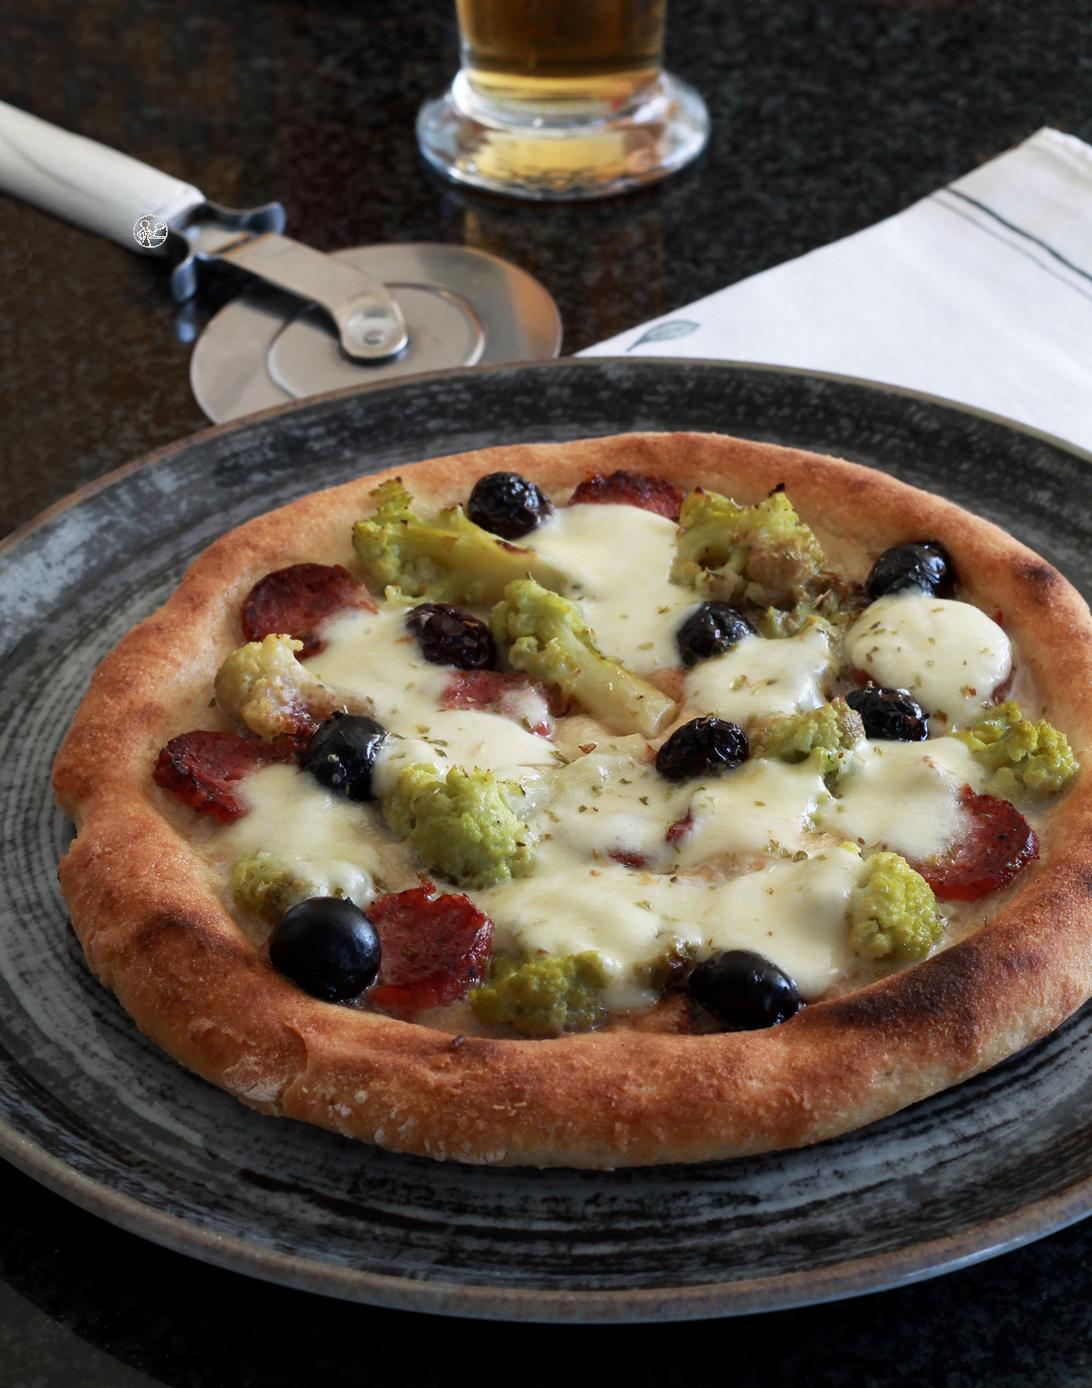 Pizza senza glutine e senza mix commerciali - La Cassata Celiaca